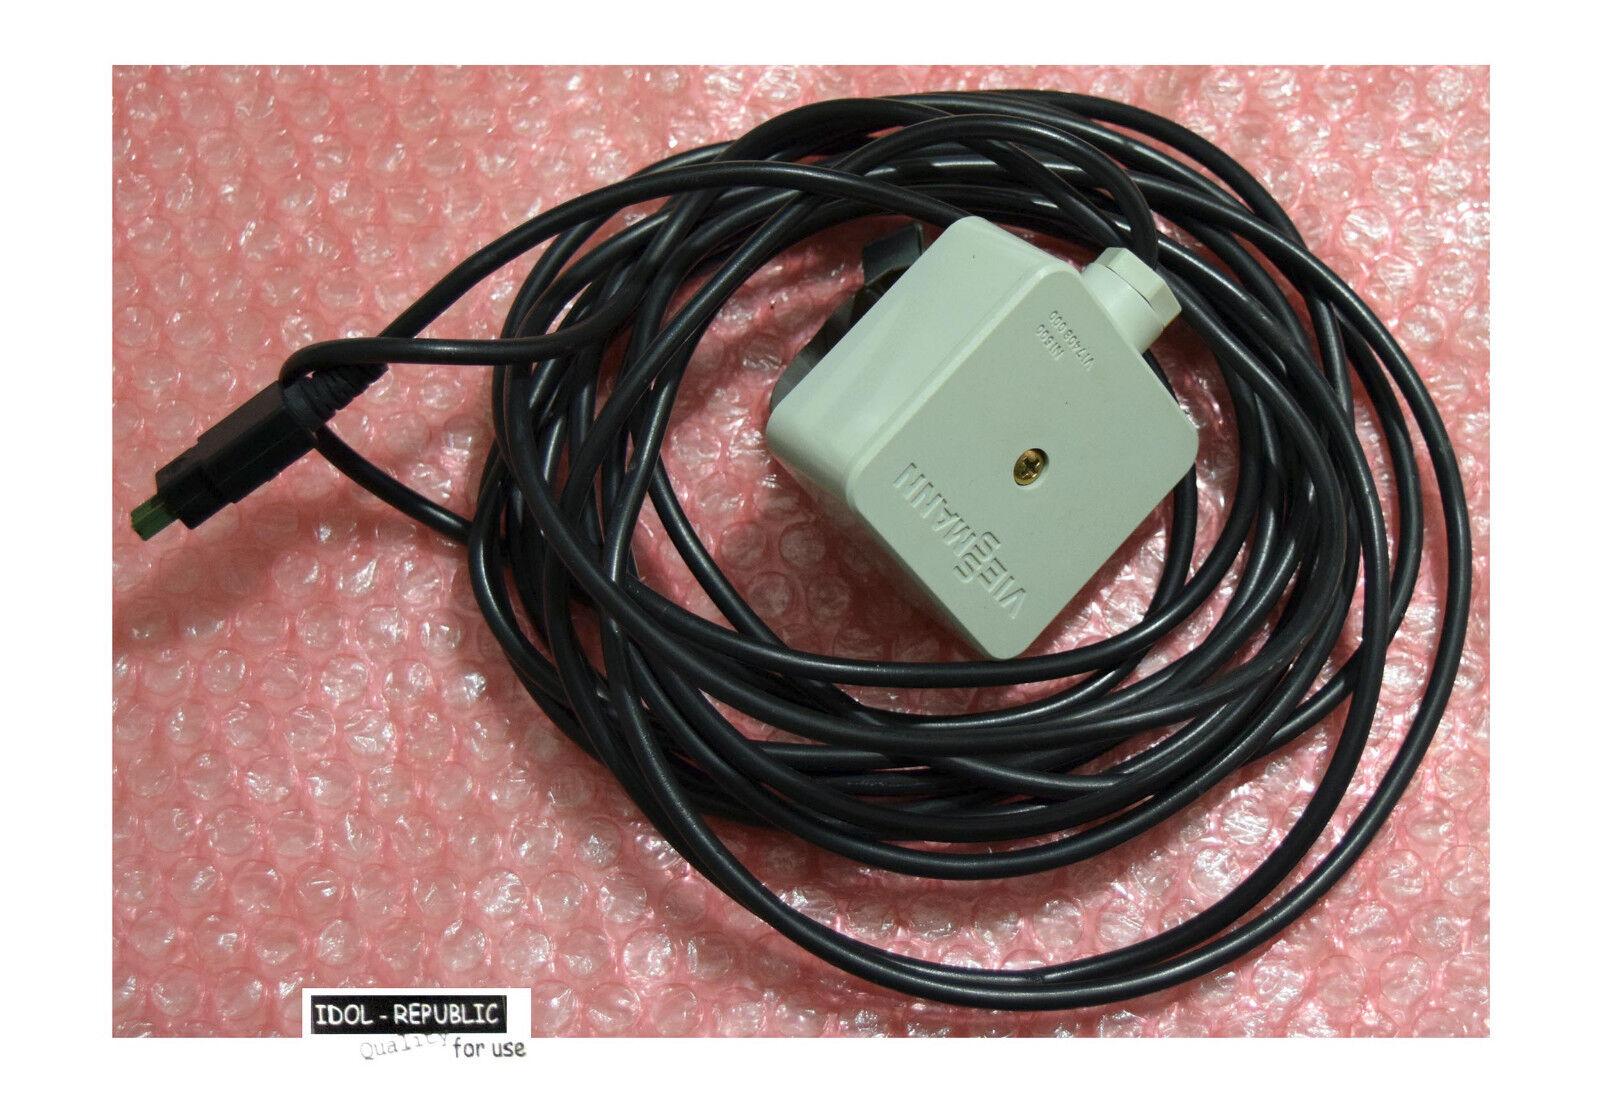 Viessmann 7408000 Vorlauffühler - Dekamatik Trimatik MC / B Mirola usw. Fühler